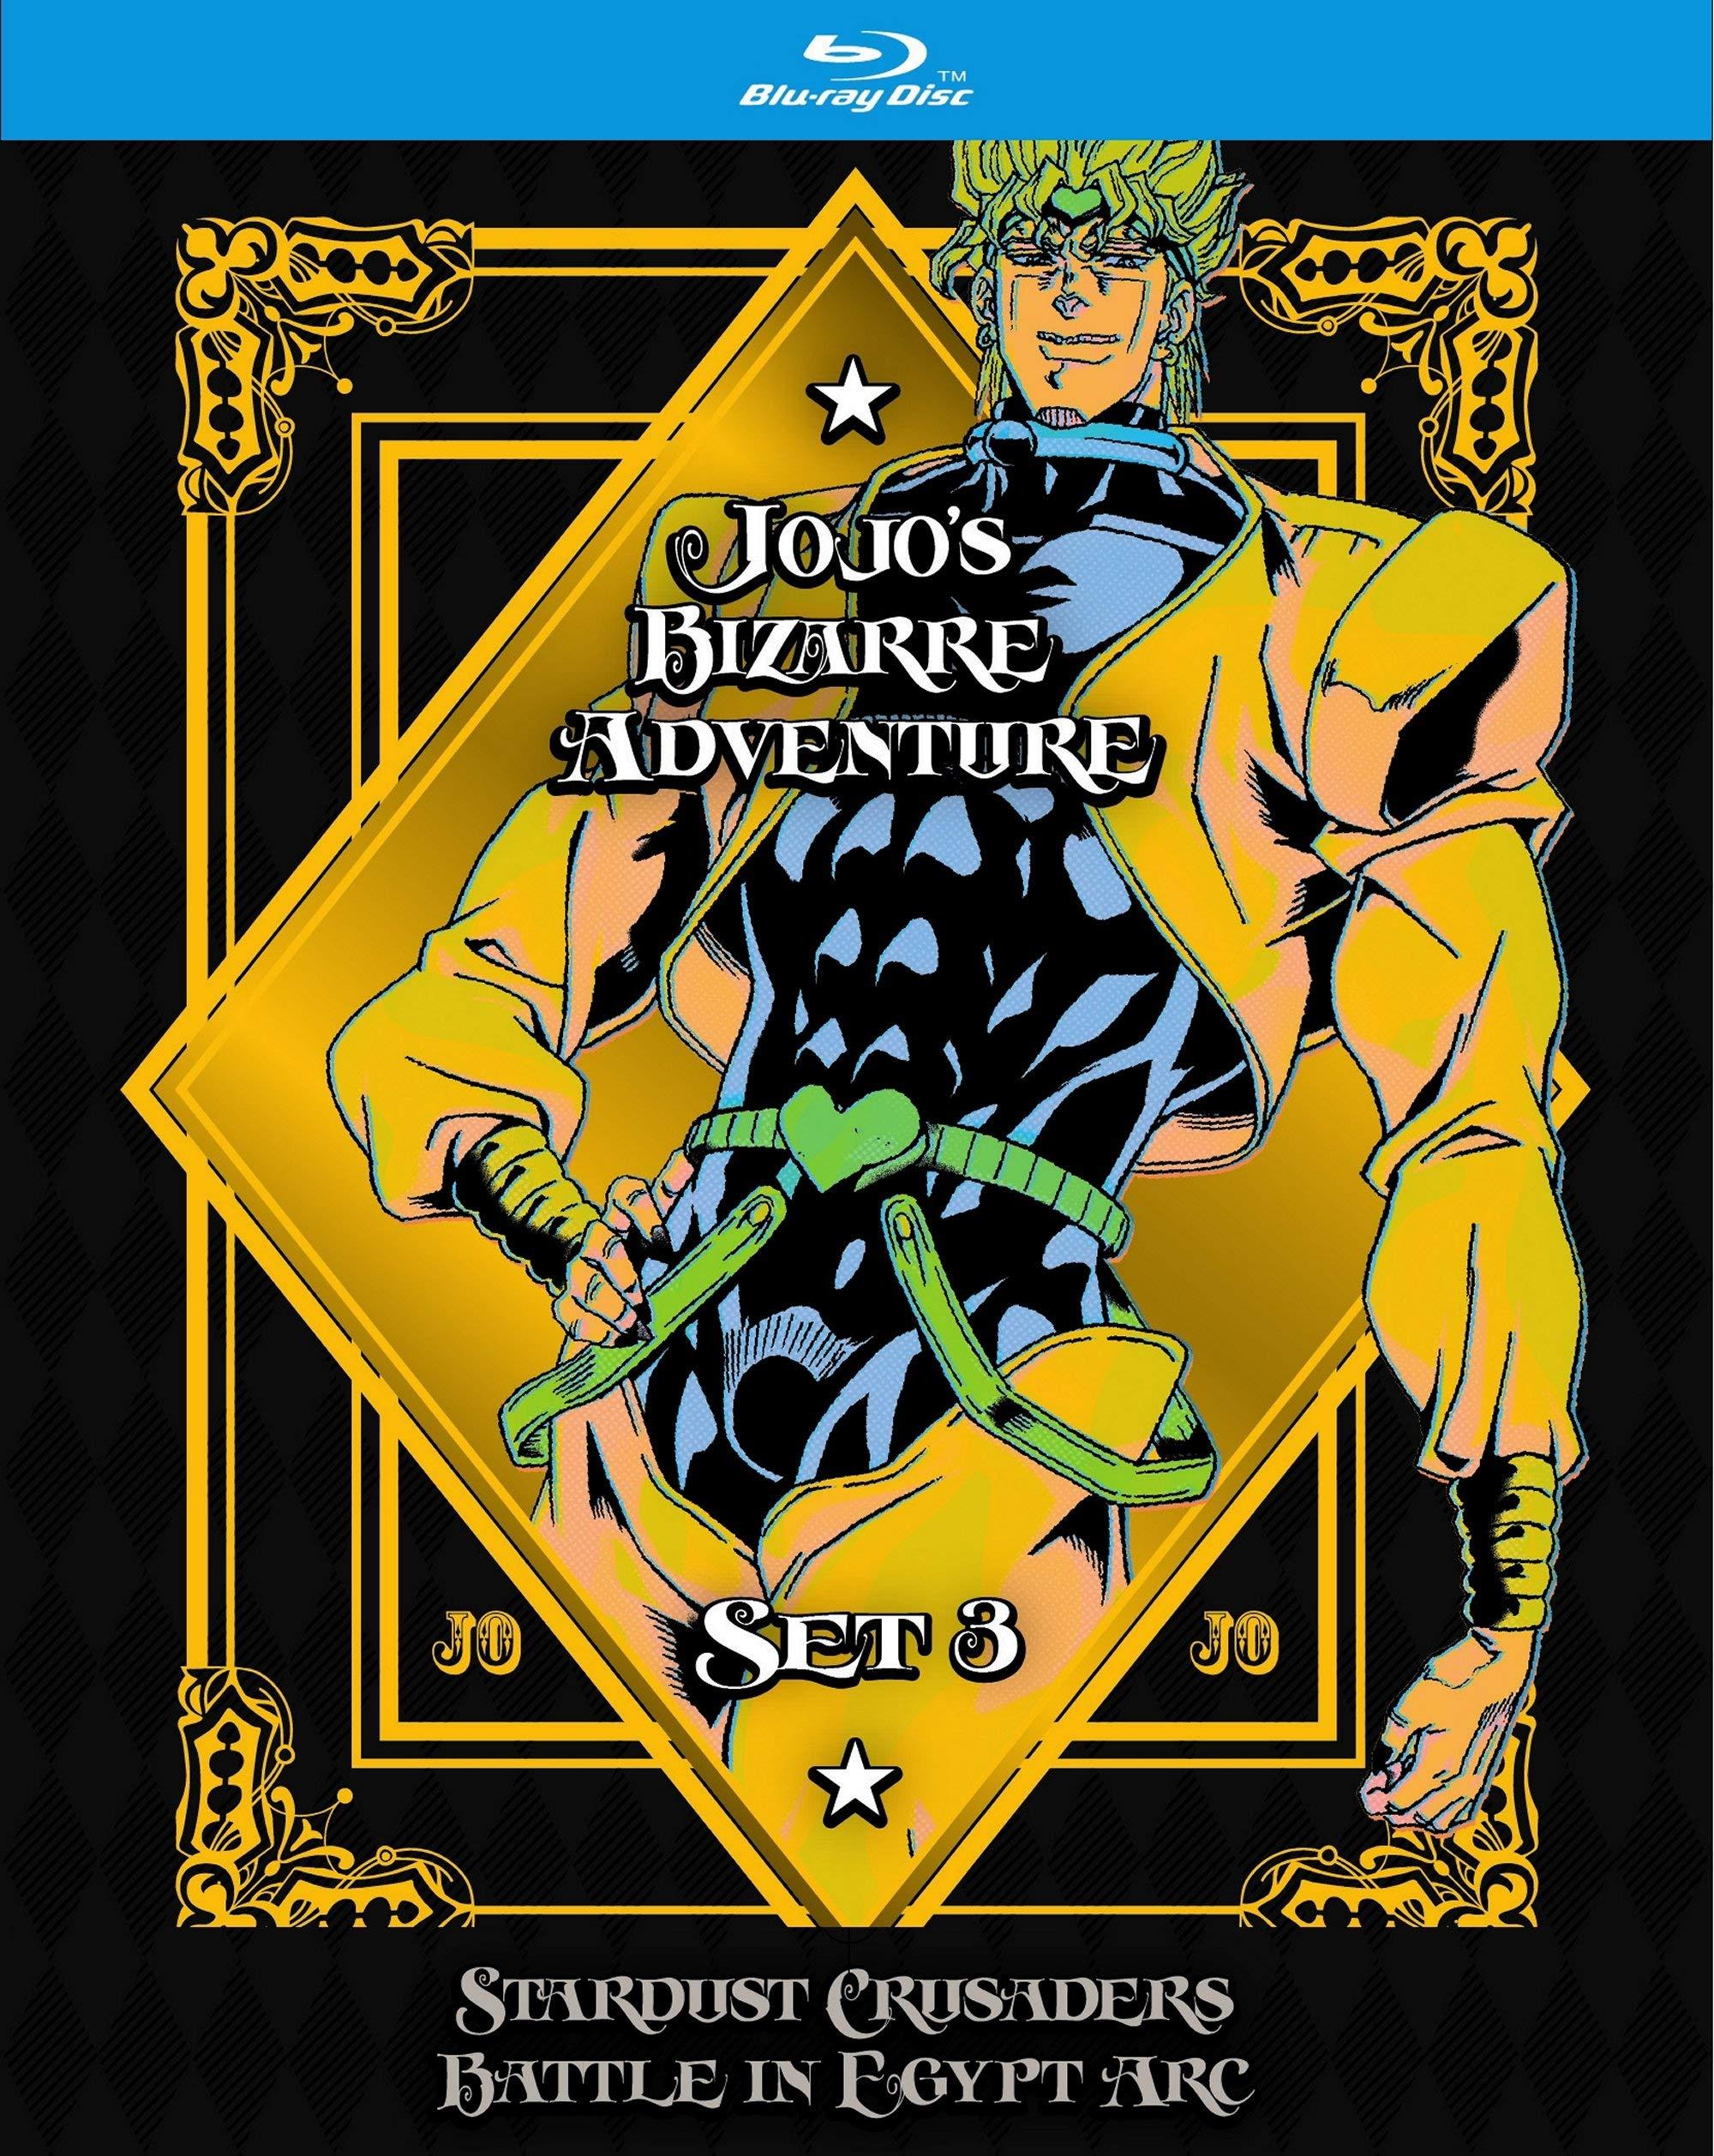 Blu-ray : Jojo's Bizarre Adventure Set 3: Stardust Crusaders (Limited Edition, Boxed Set)